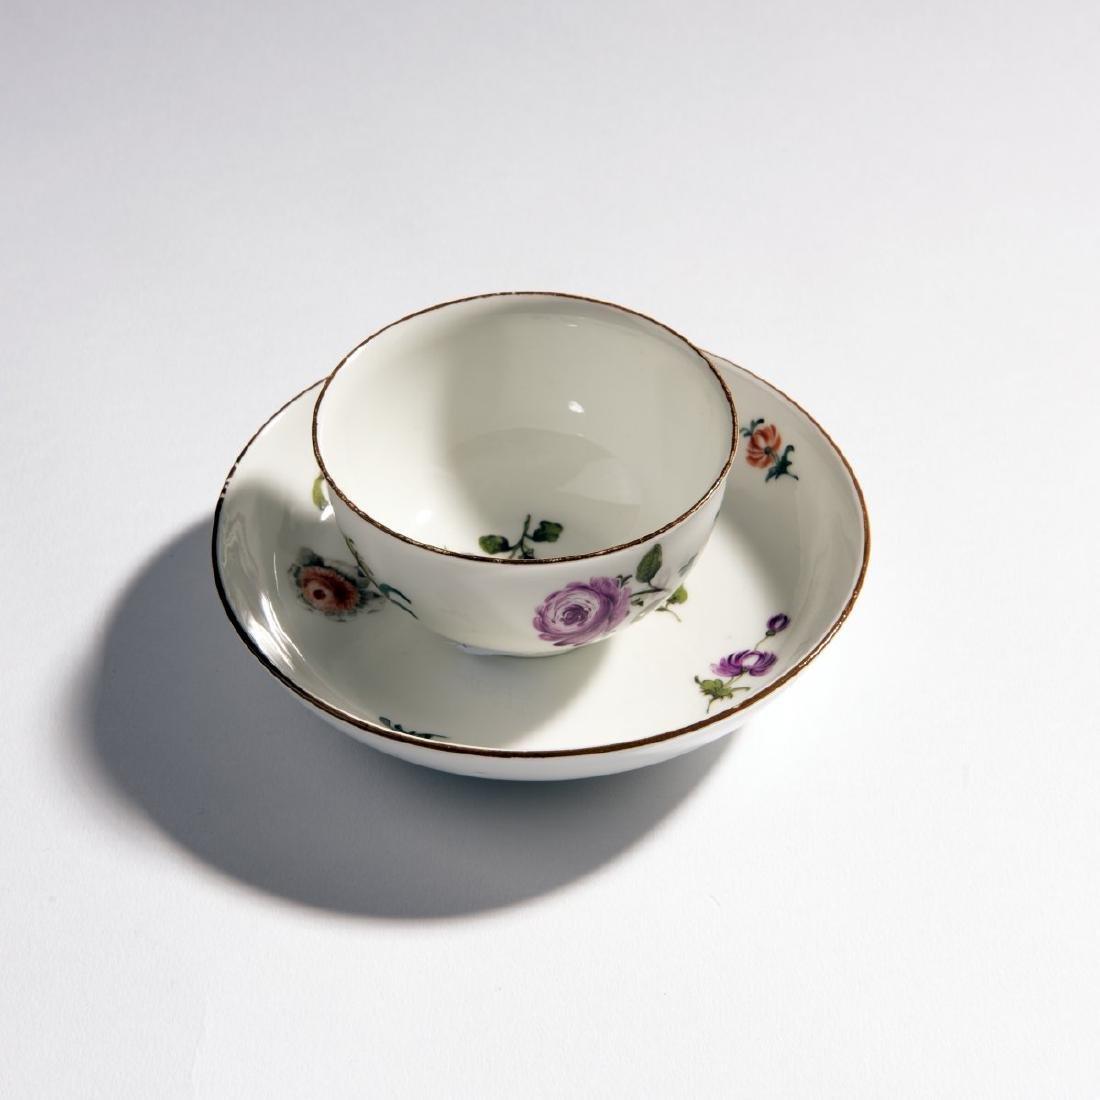 KPM Meissen, Teacup with saucer 'German Flower', c.